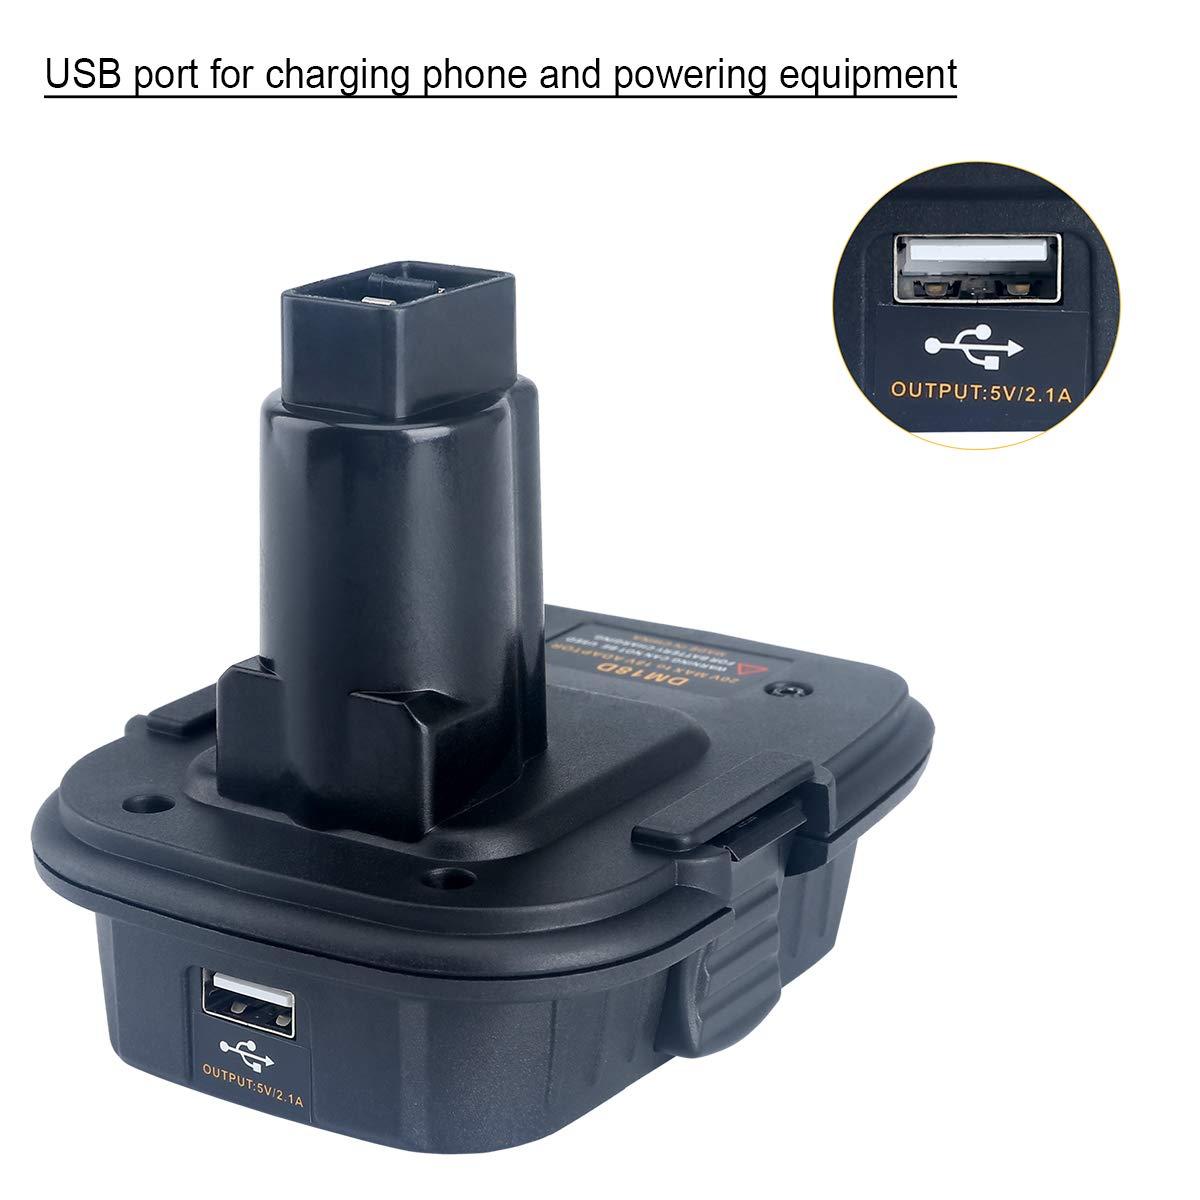 Lasica 20V Battery Adapter DCA1820 with USB port for Dewalt 18V Tools, Convert Milwaukee 18V Lithium Battery M18 DeWalt MAX 20Volt Lithium-Ion Battery DCB204 to DeWalt 18V NiCad NiMh Battery DC9096 by Lasica (Image #3)